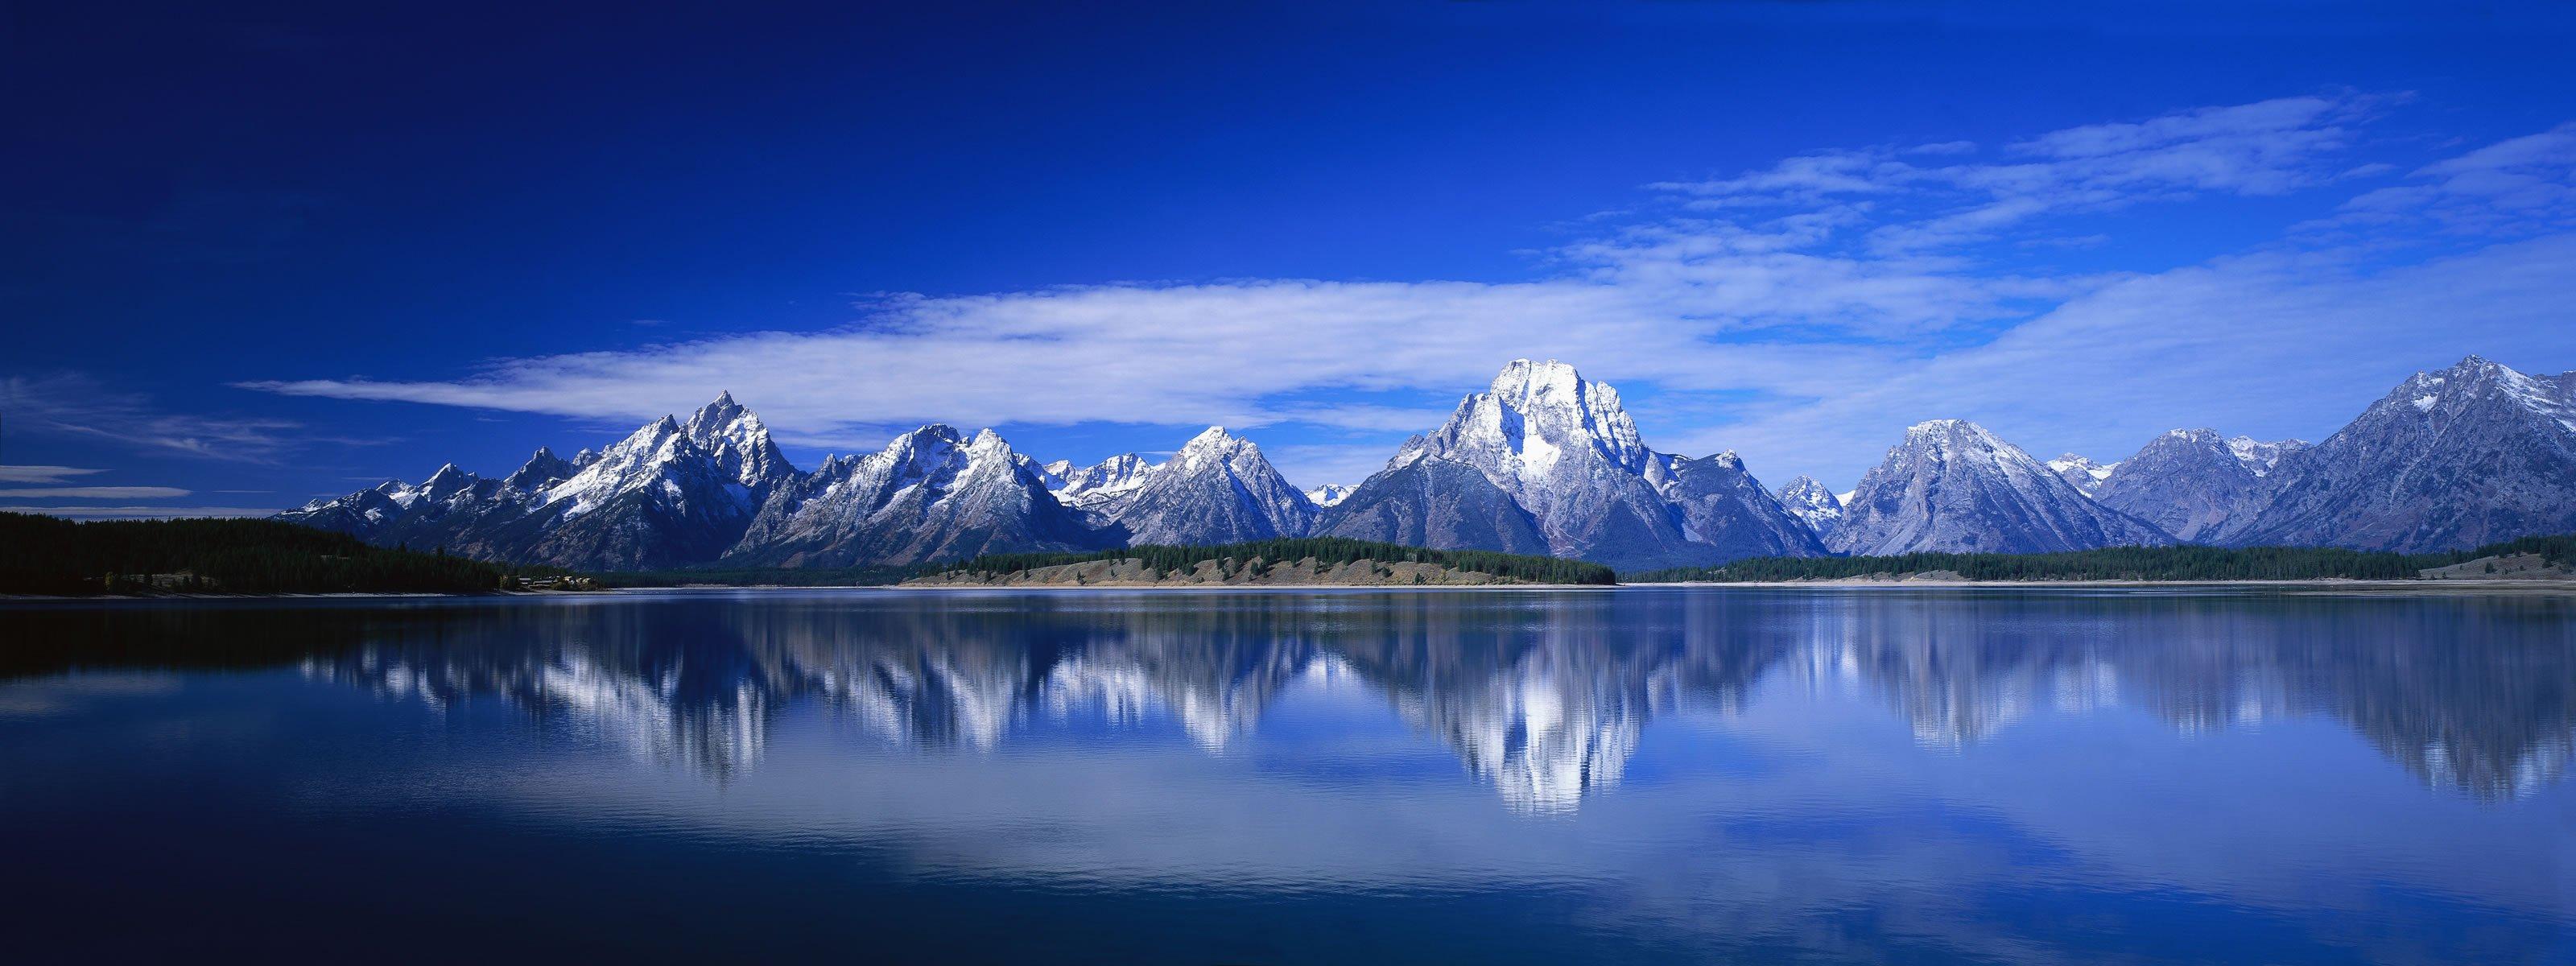 sky blue mountain reflection - photo #7